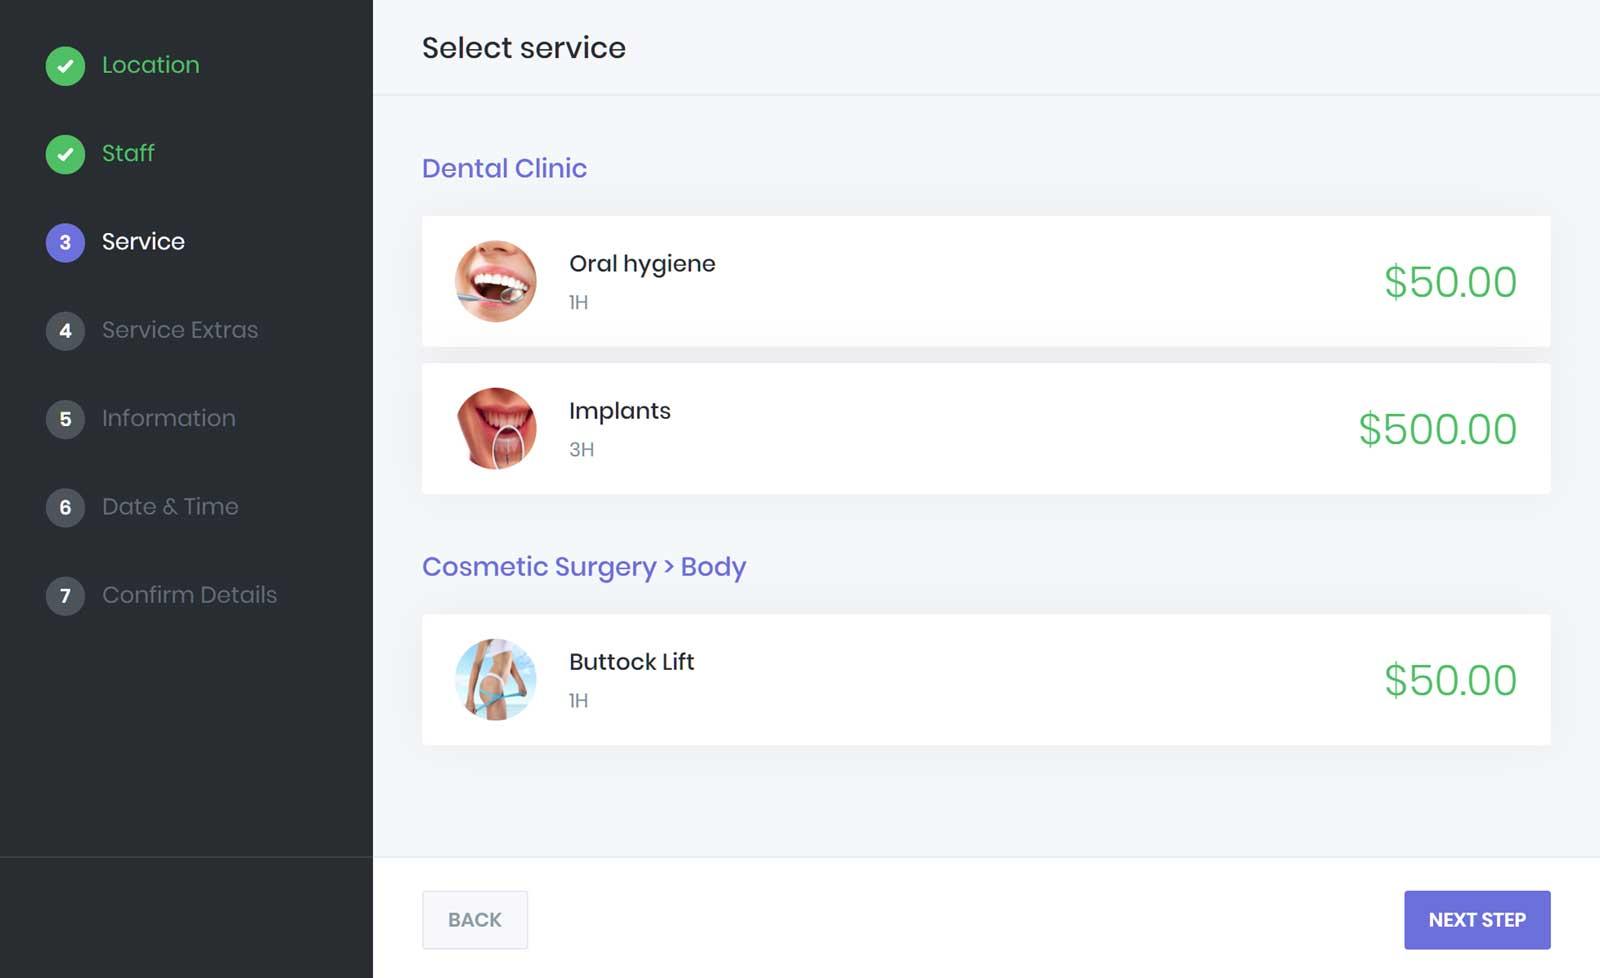 Select a Service